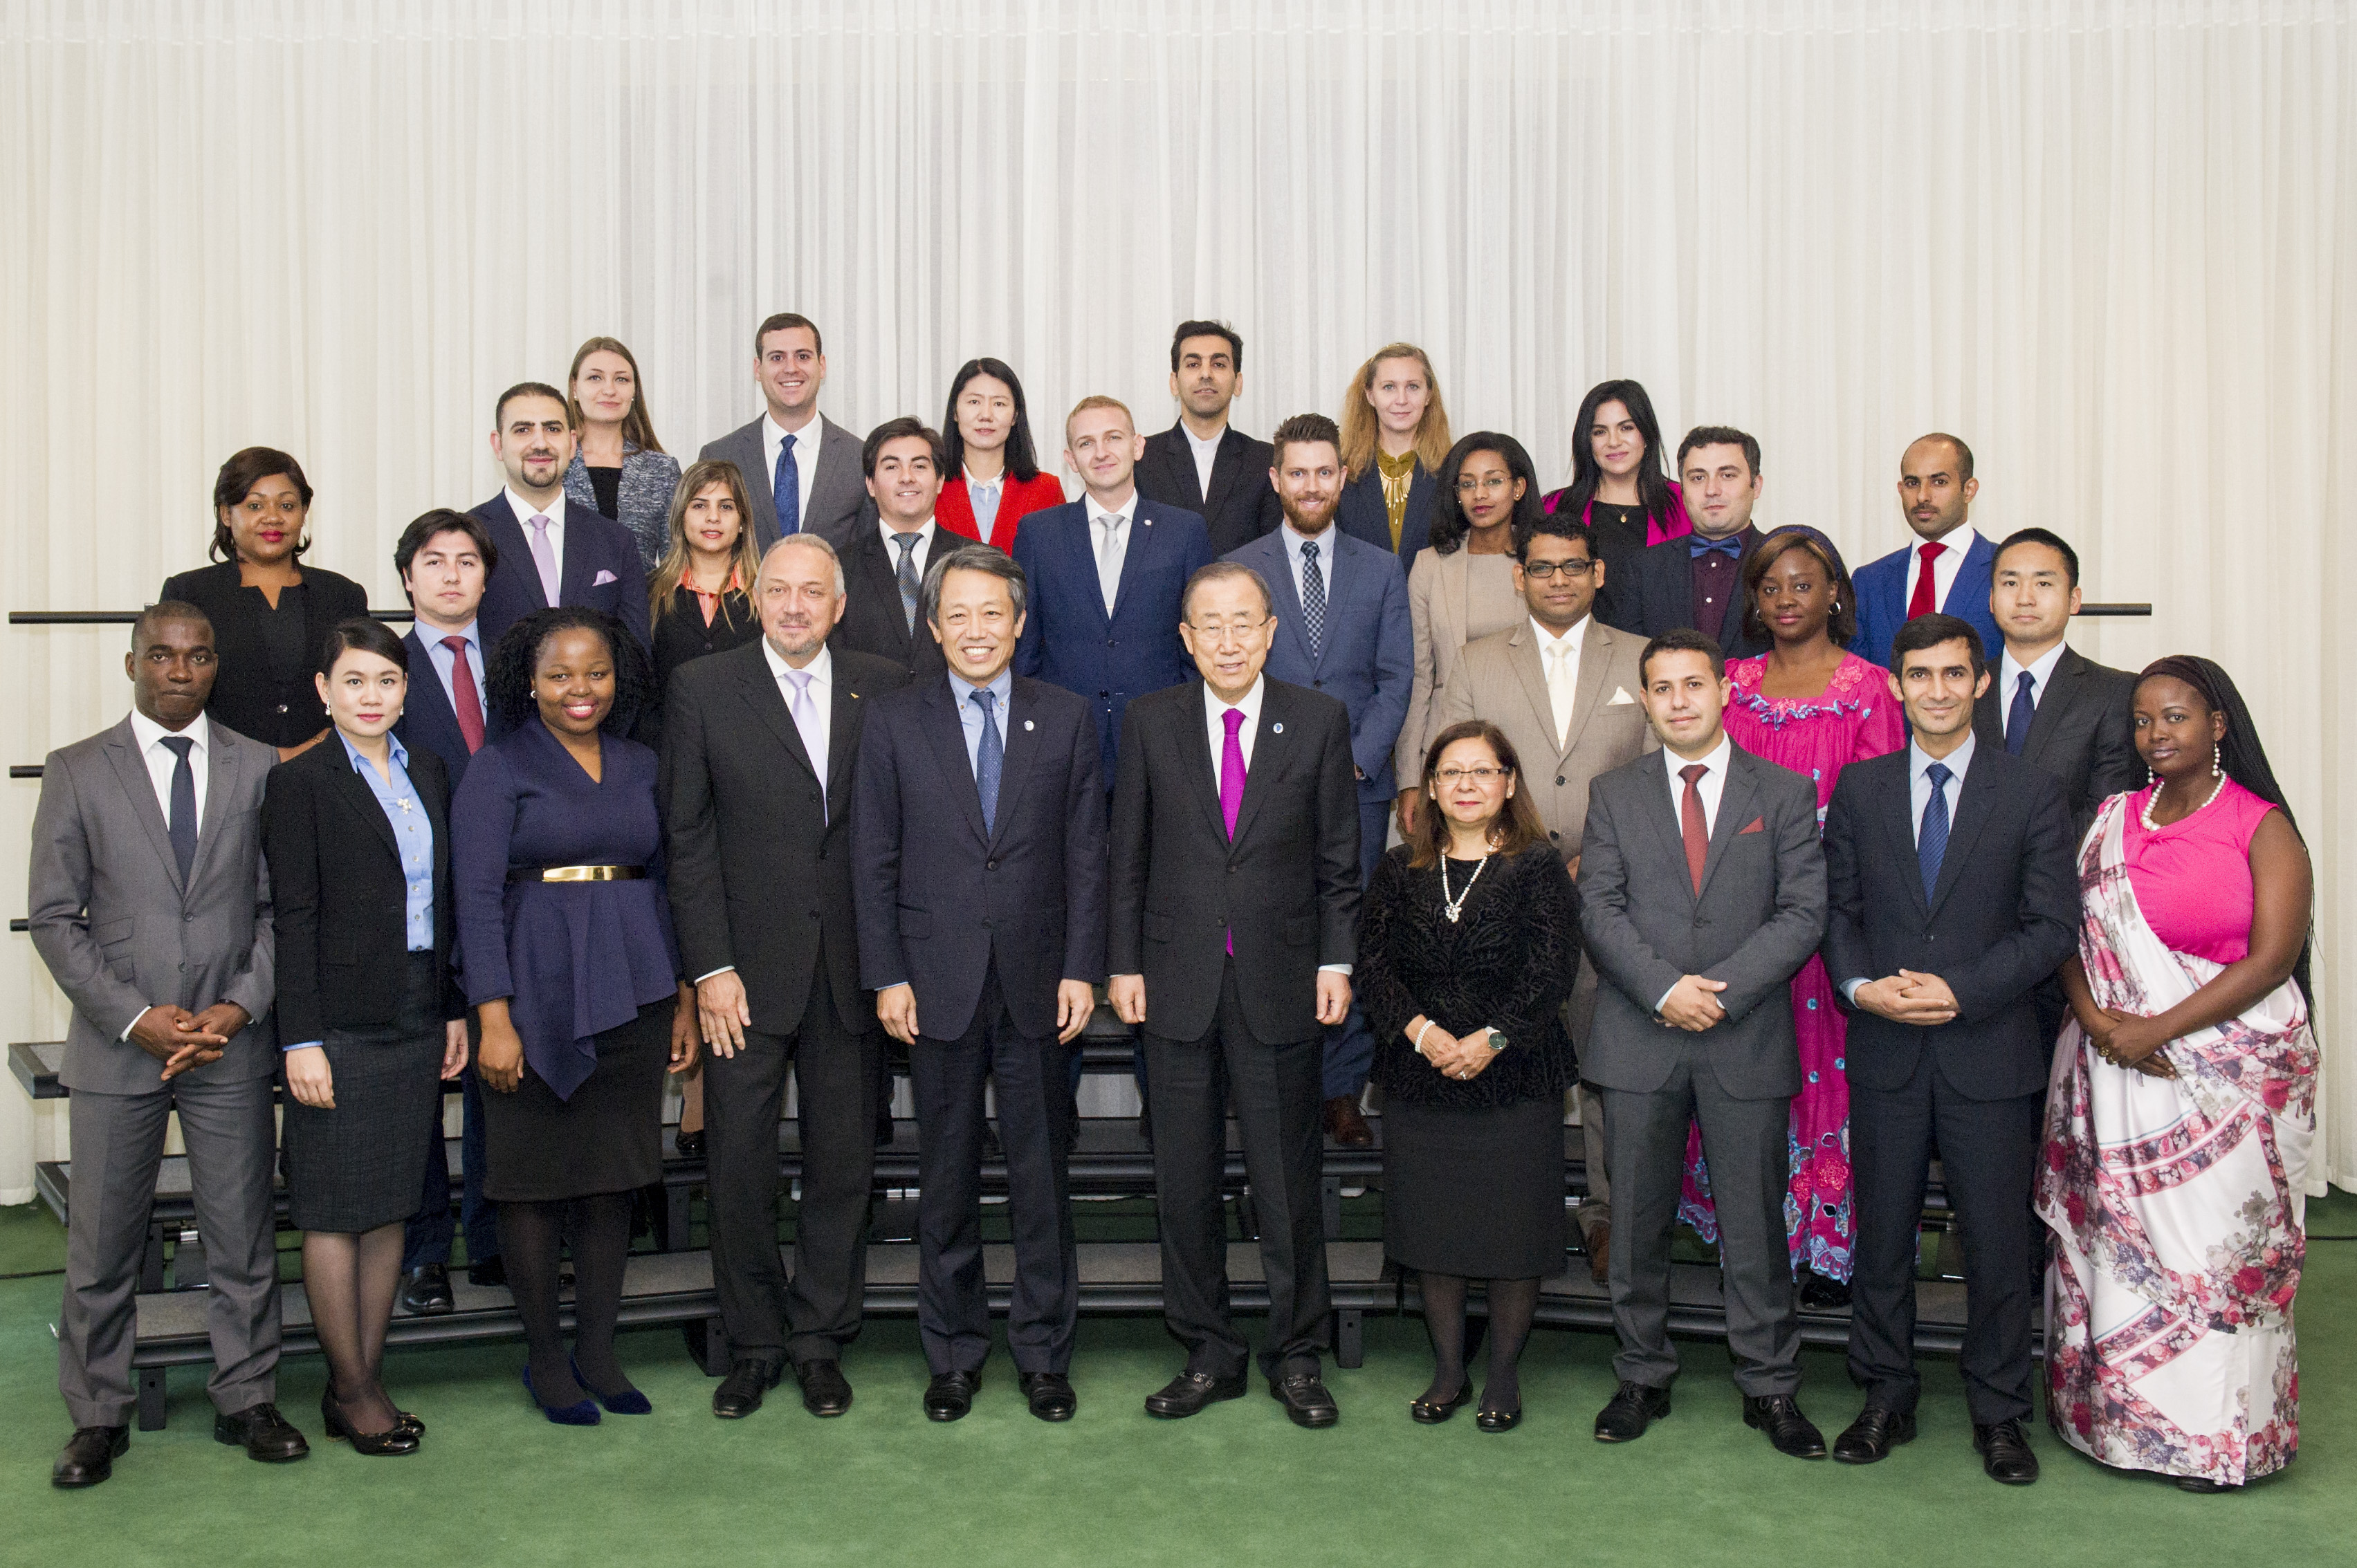 Secretary General Ban Ki-moon with 2016 United Nations Disarmament Fellows